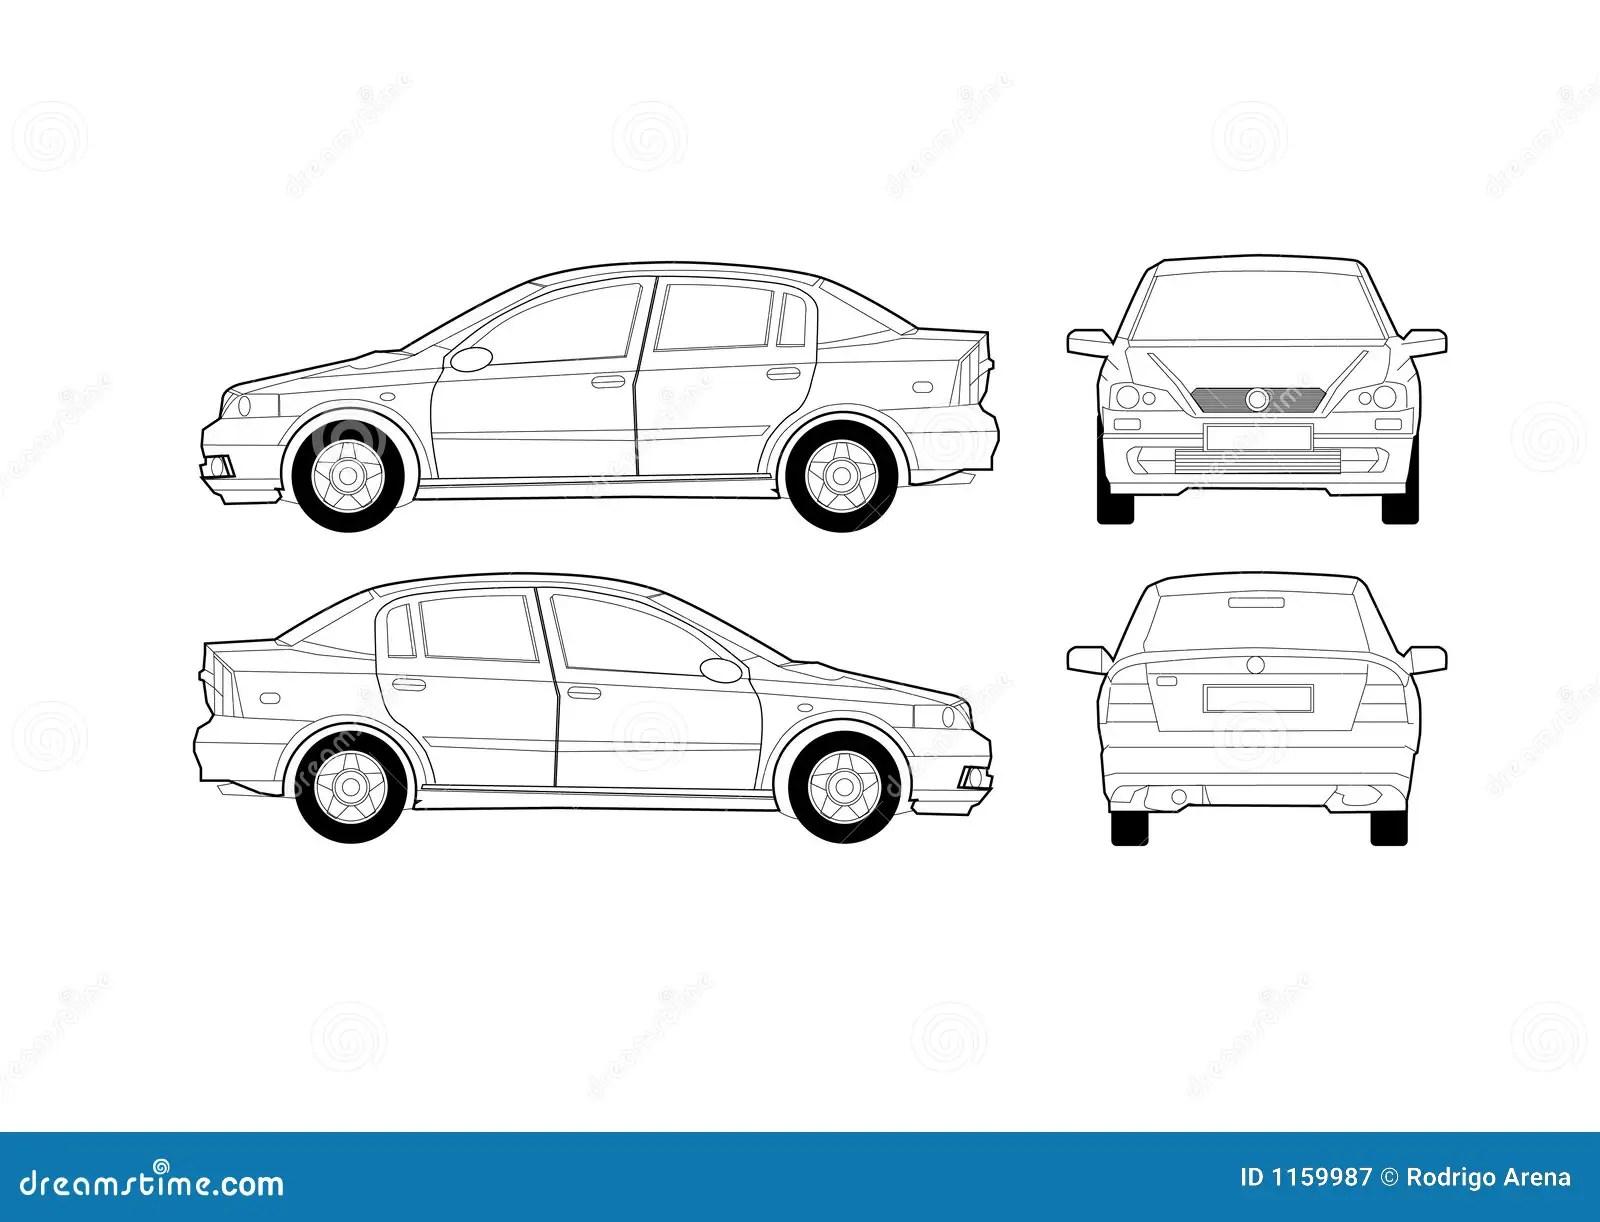 hight resolution of generic saloon car diagram